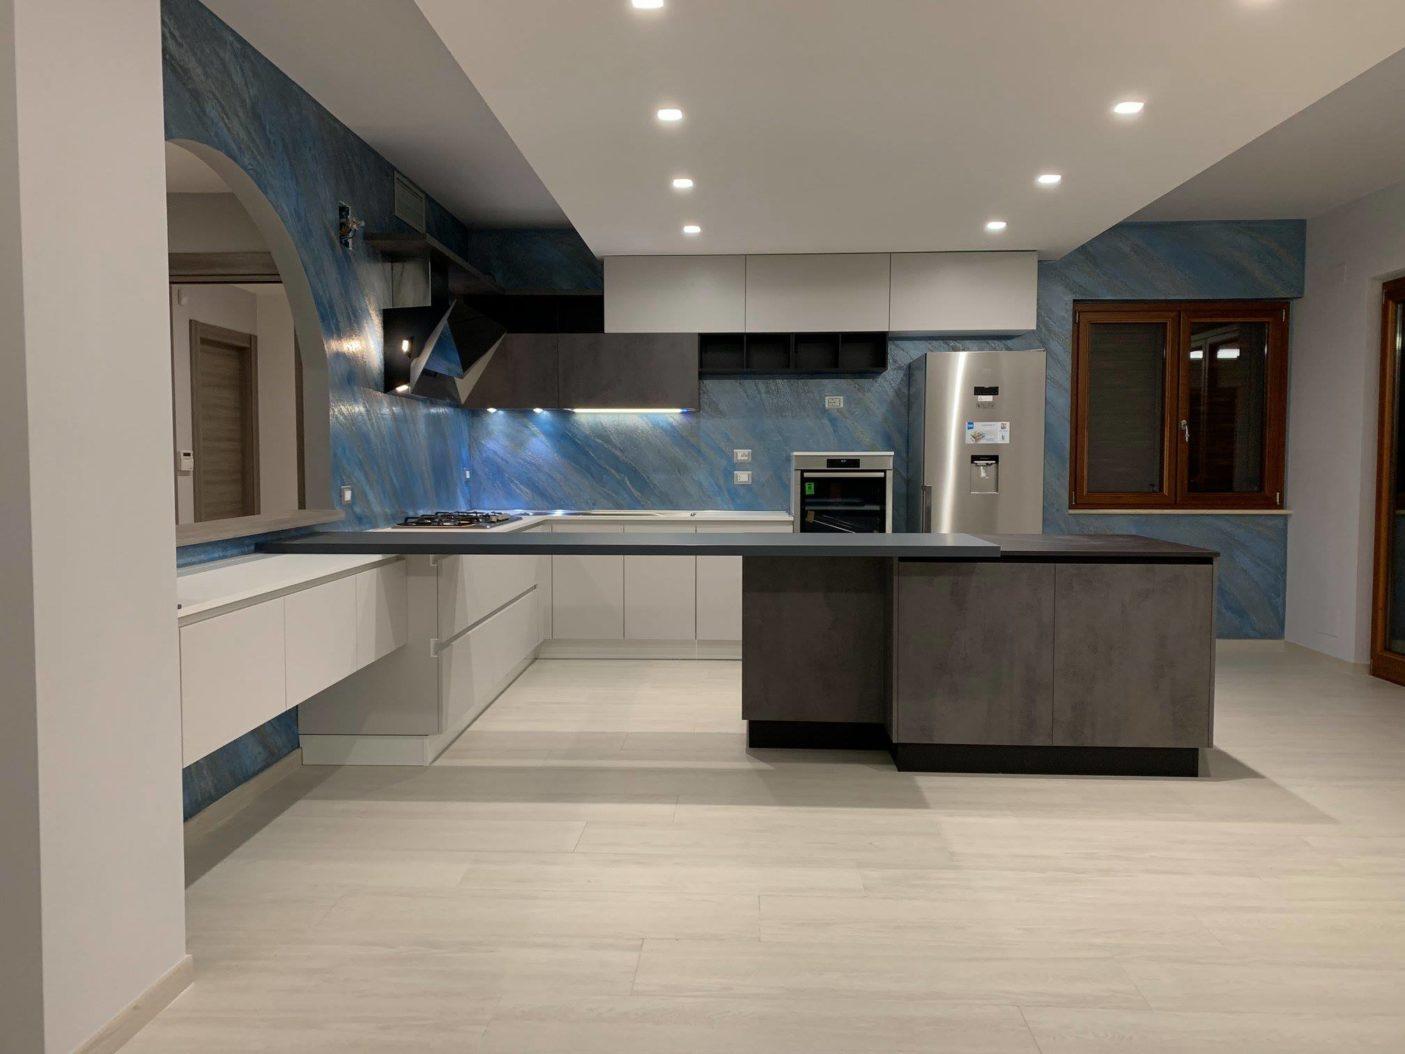 Cucina-Creo-Kitchens-Tablet-dekton-Cosentino1.jpg